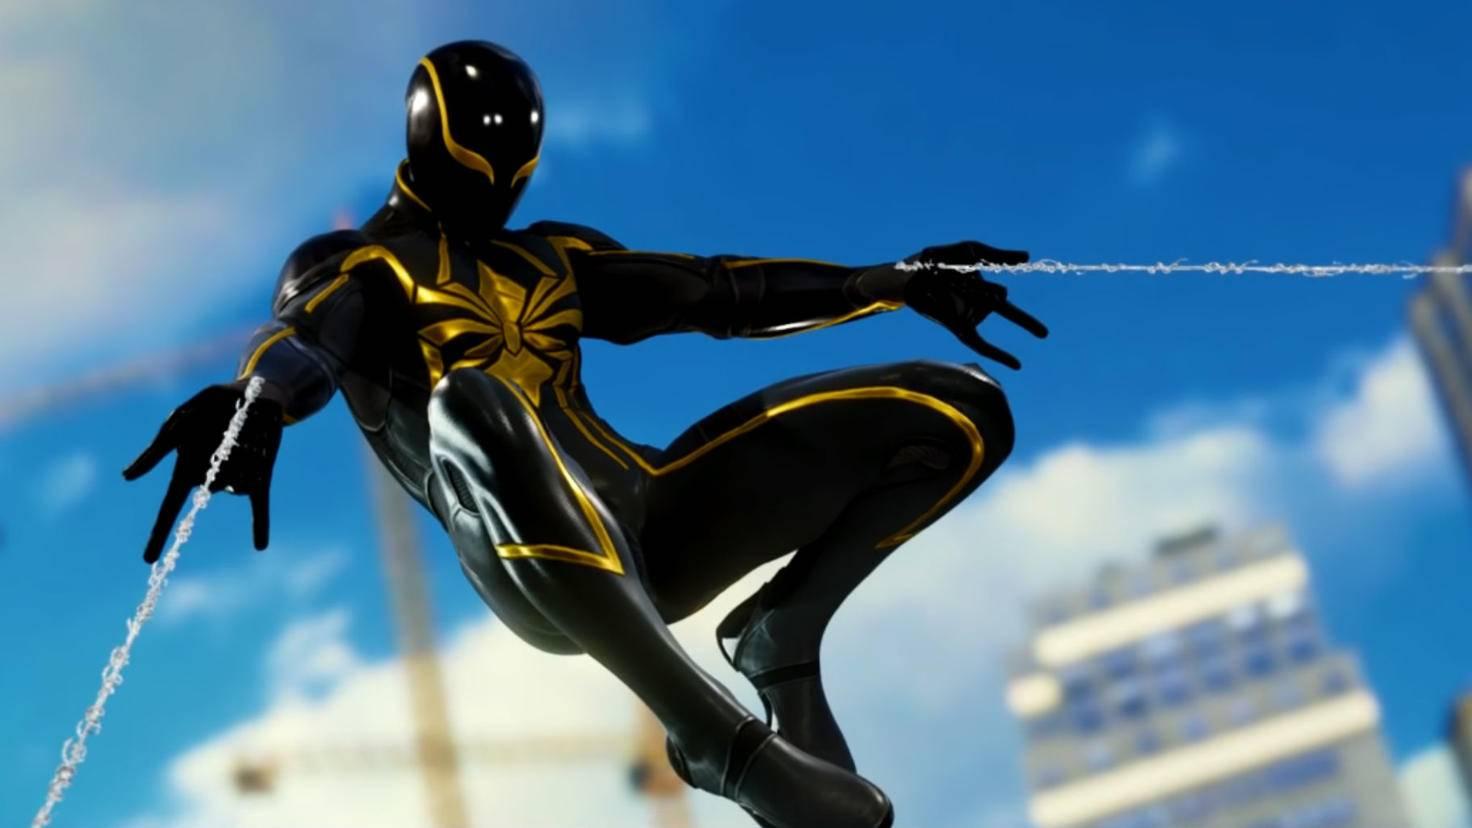 spider-man-ps4-armor-mk-2-screenshot